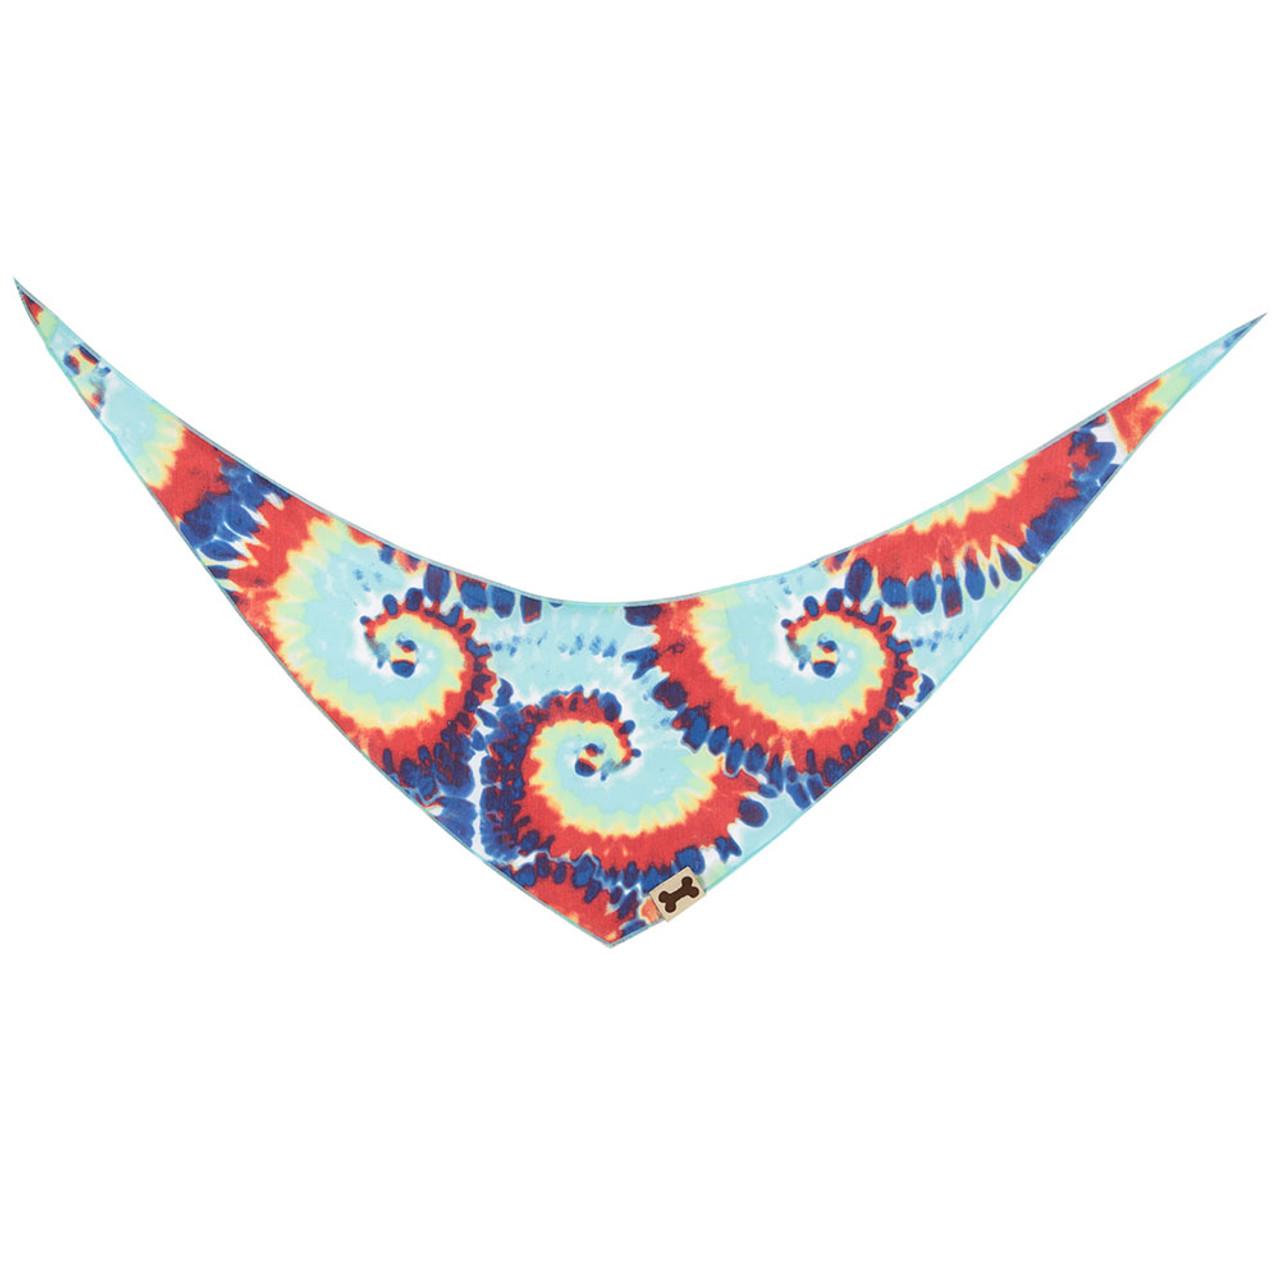 SimplyDog Tie-Dye Print Dog Bandana - Back